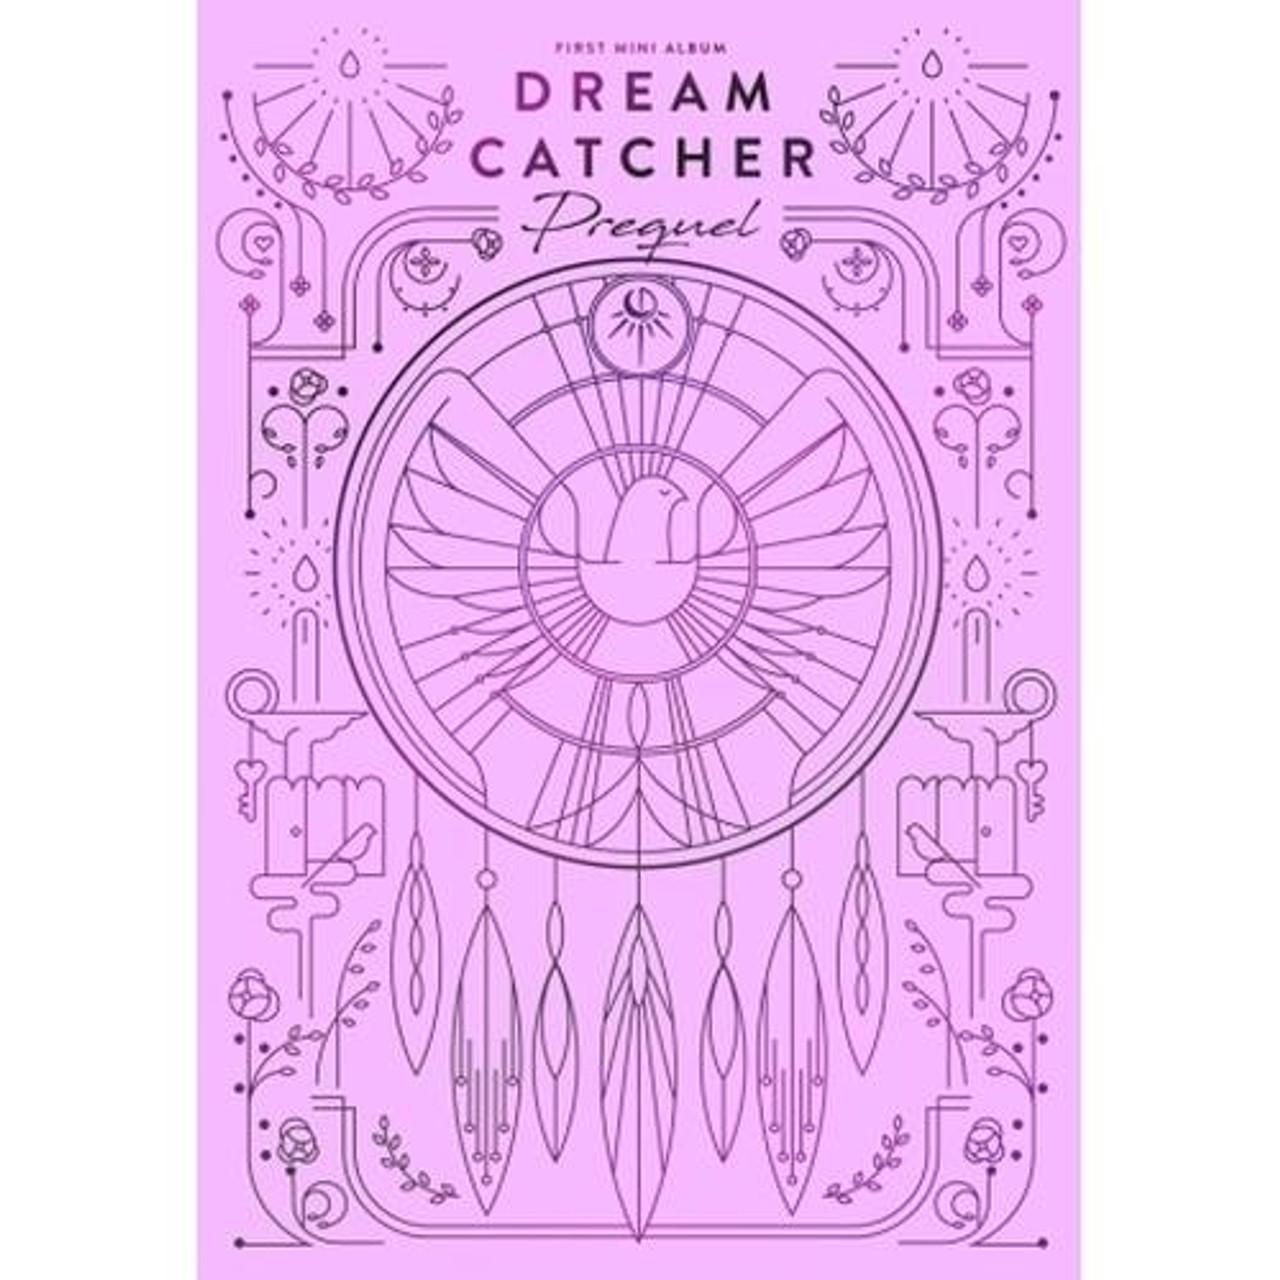 DREAM CATCHER - PREQUEL(BEFORE VER.)